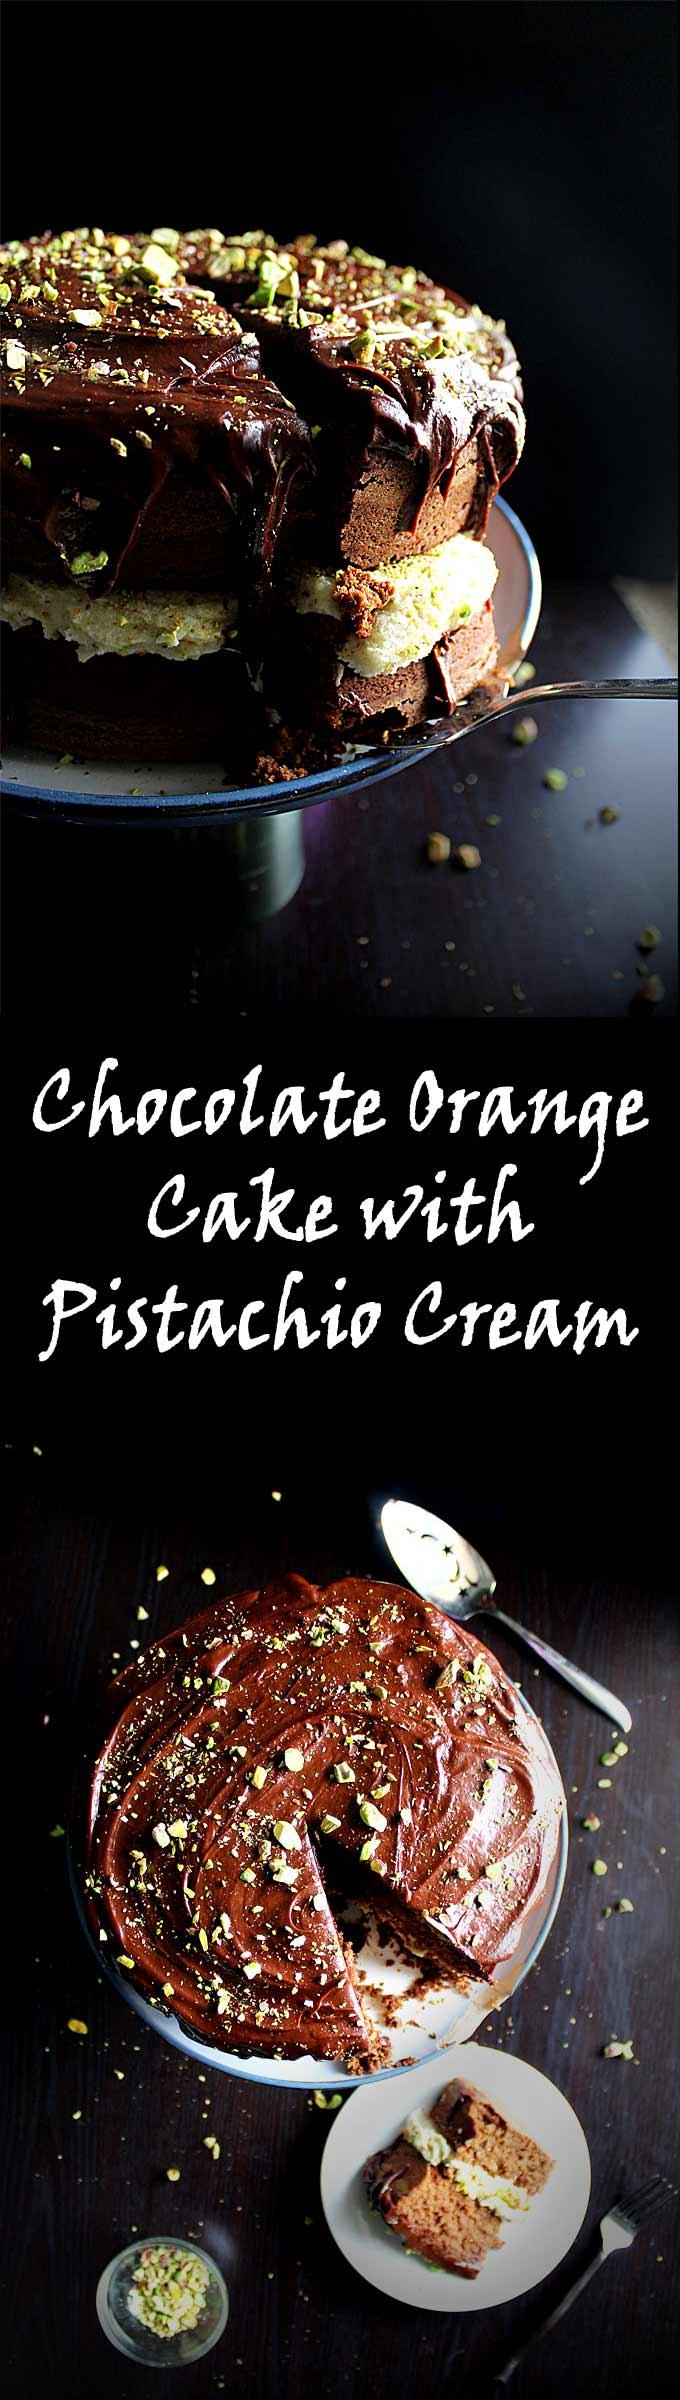 Chocolate Orange Cake with Pistachio Mascarpone Filling & Chocolate Ganache   Pistachio Frosting   Orange Cake   Chocolate Ganache   Birthday Cake